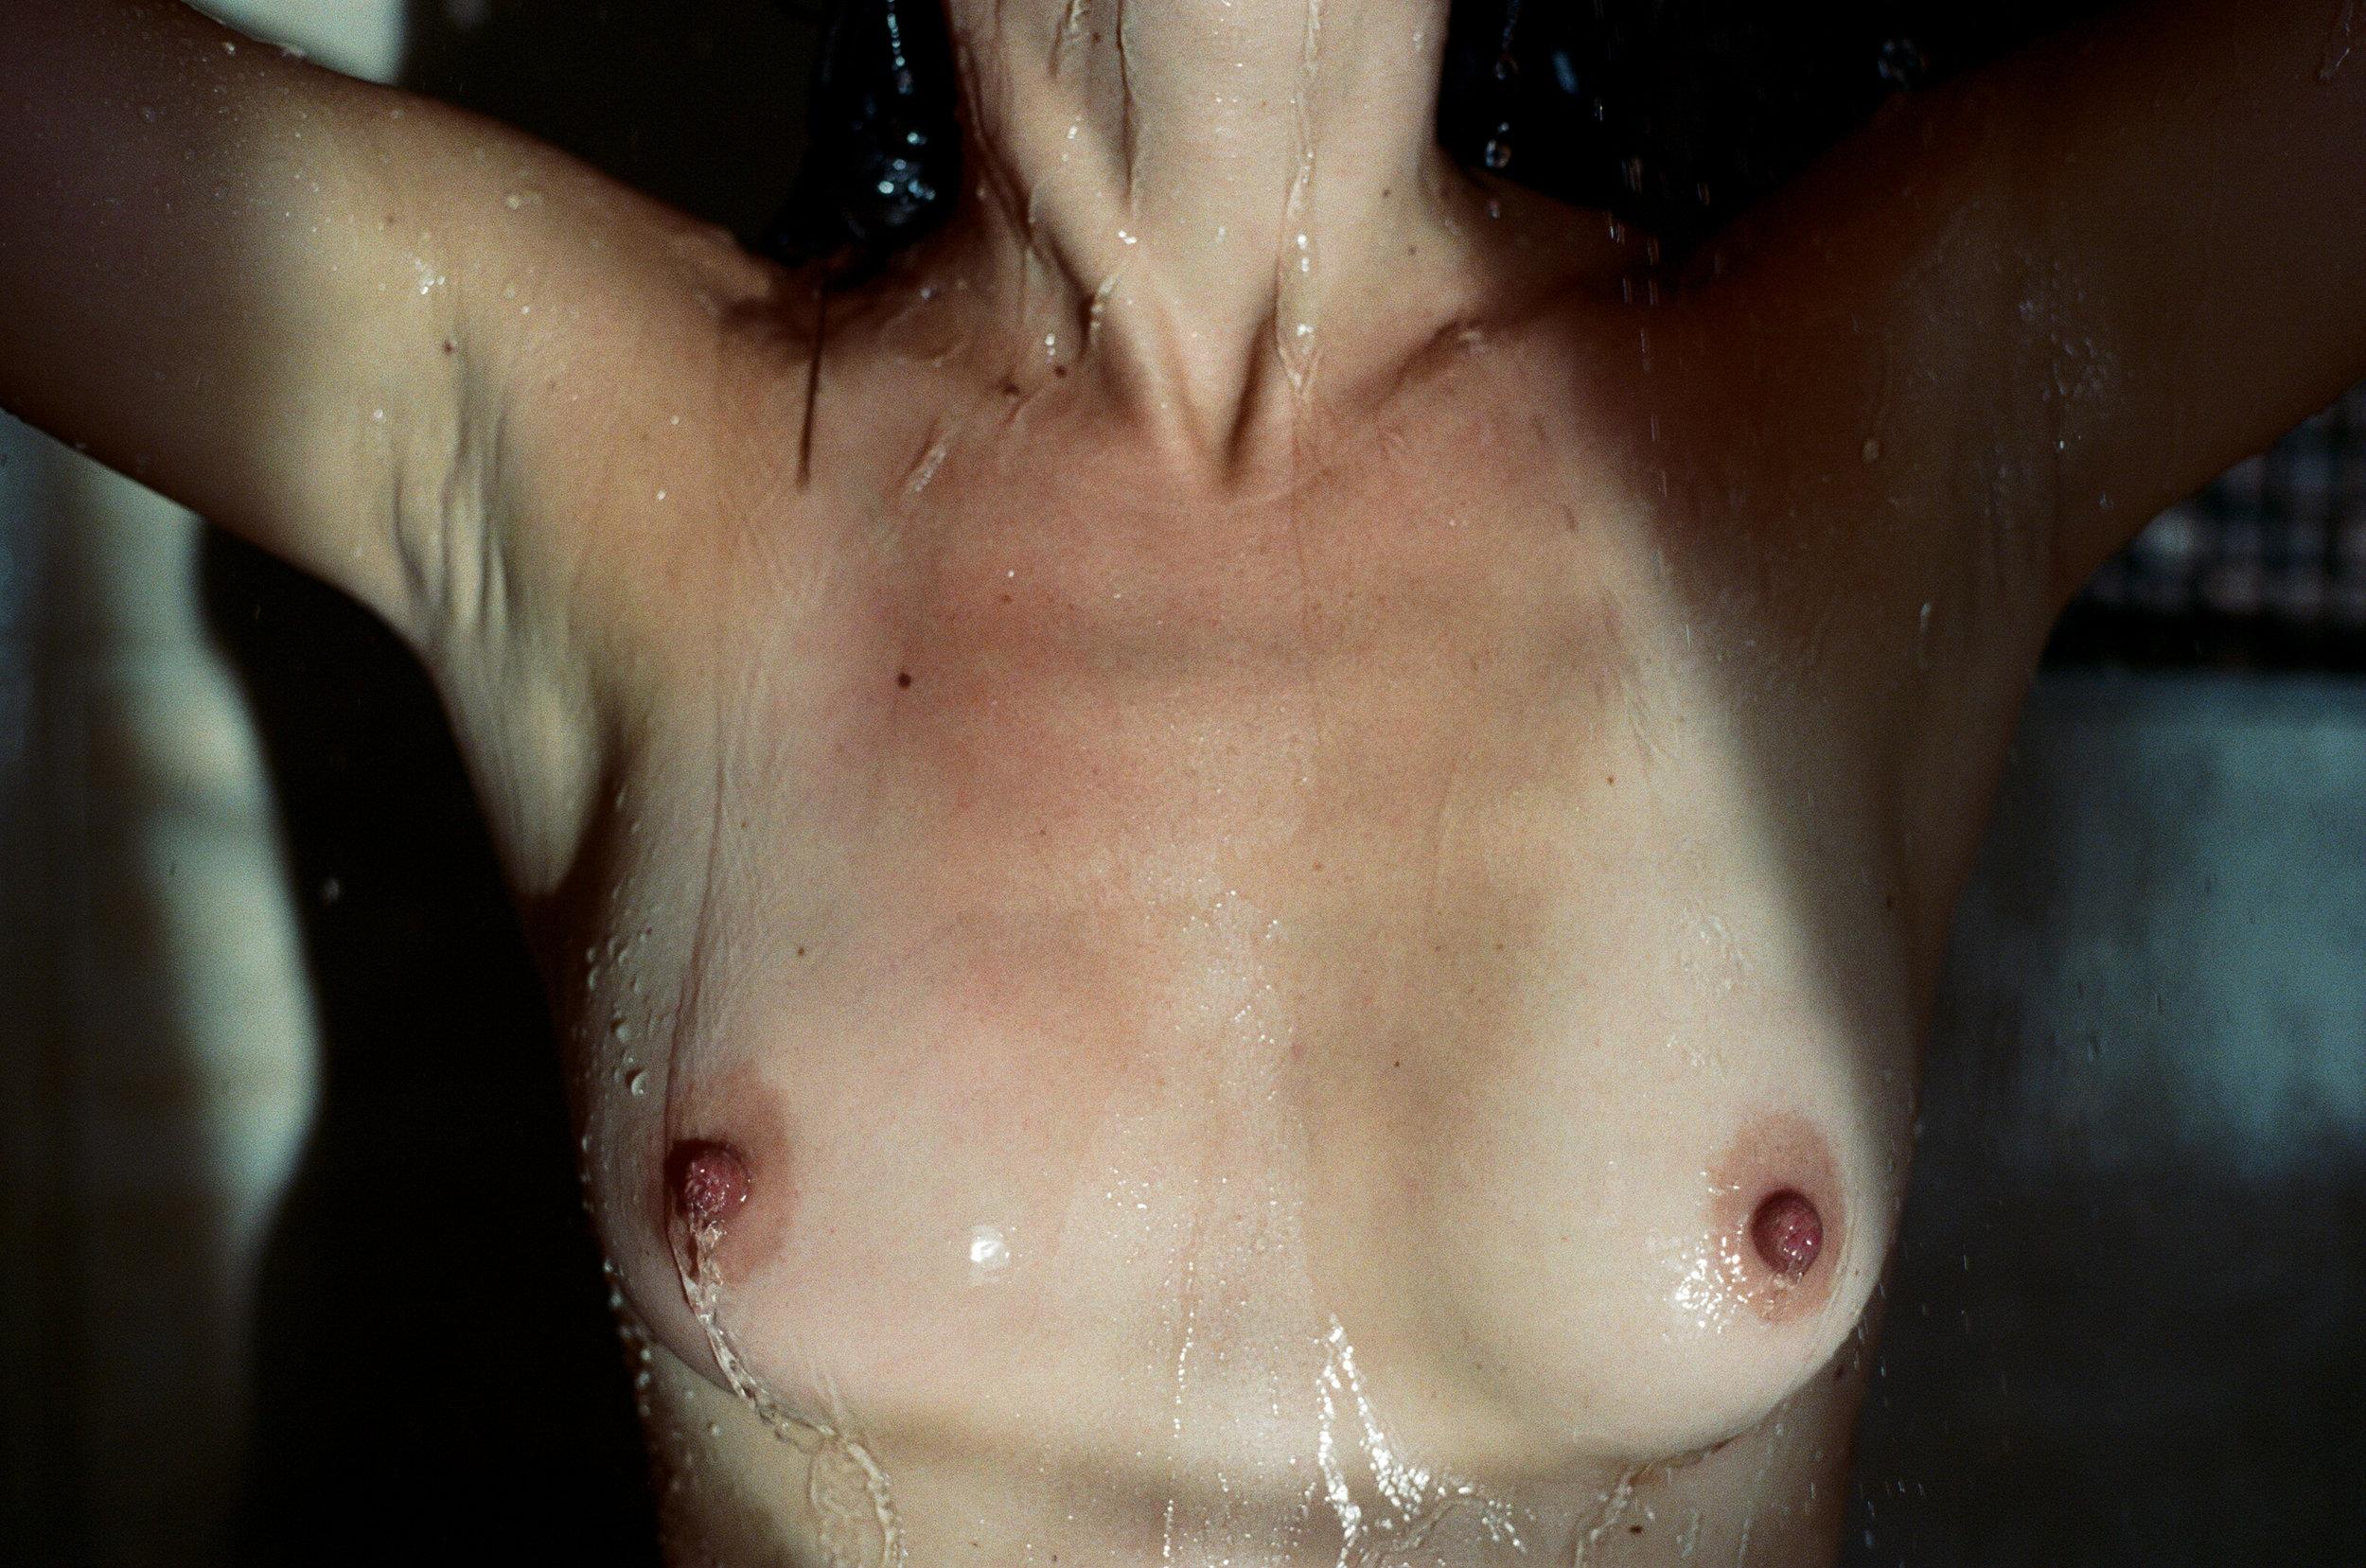 35mm film portrait. artistic nude film photograph. shower boudoir. moody boudoir. canon ae-1. moody portrait. emotional portrait. ohio portrait photographer. sarah rose photography. i am sarah rose.